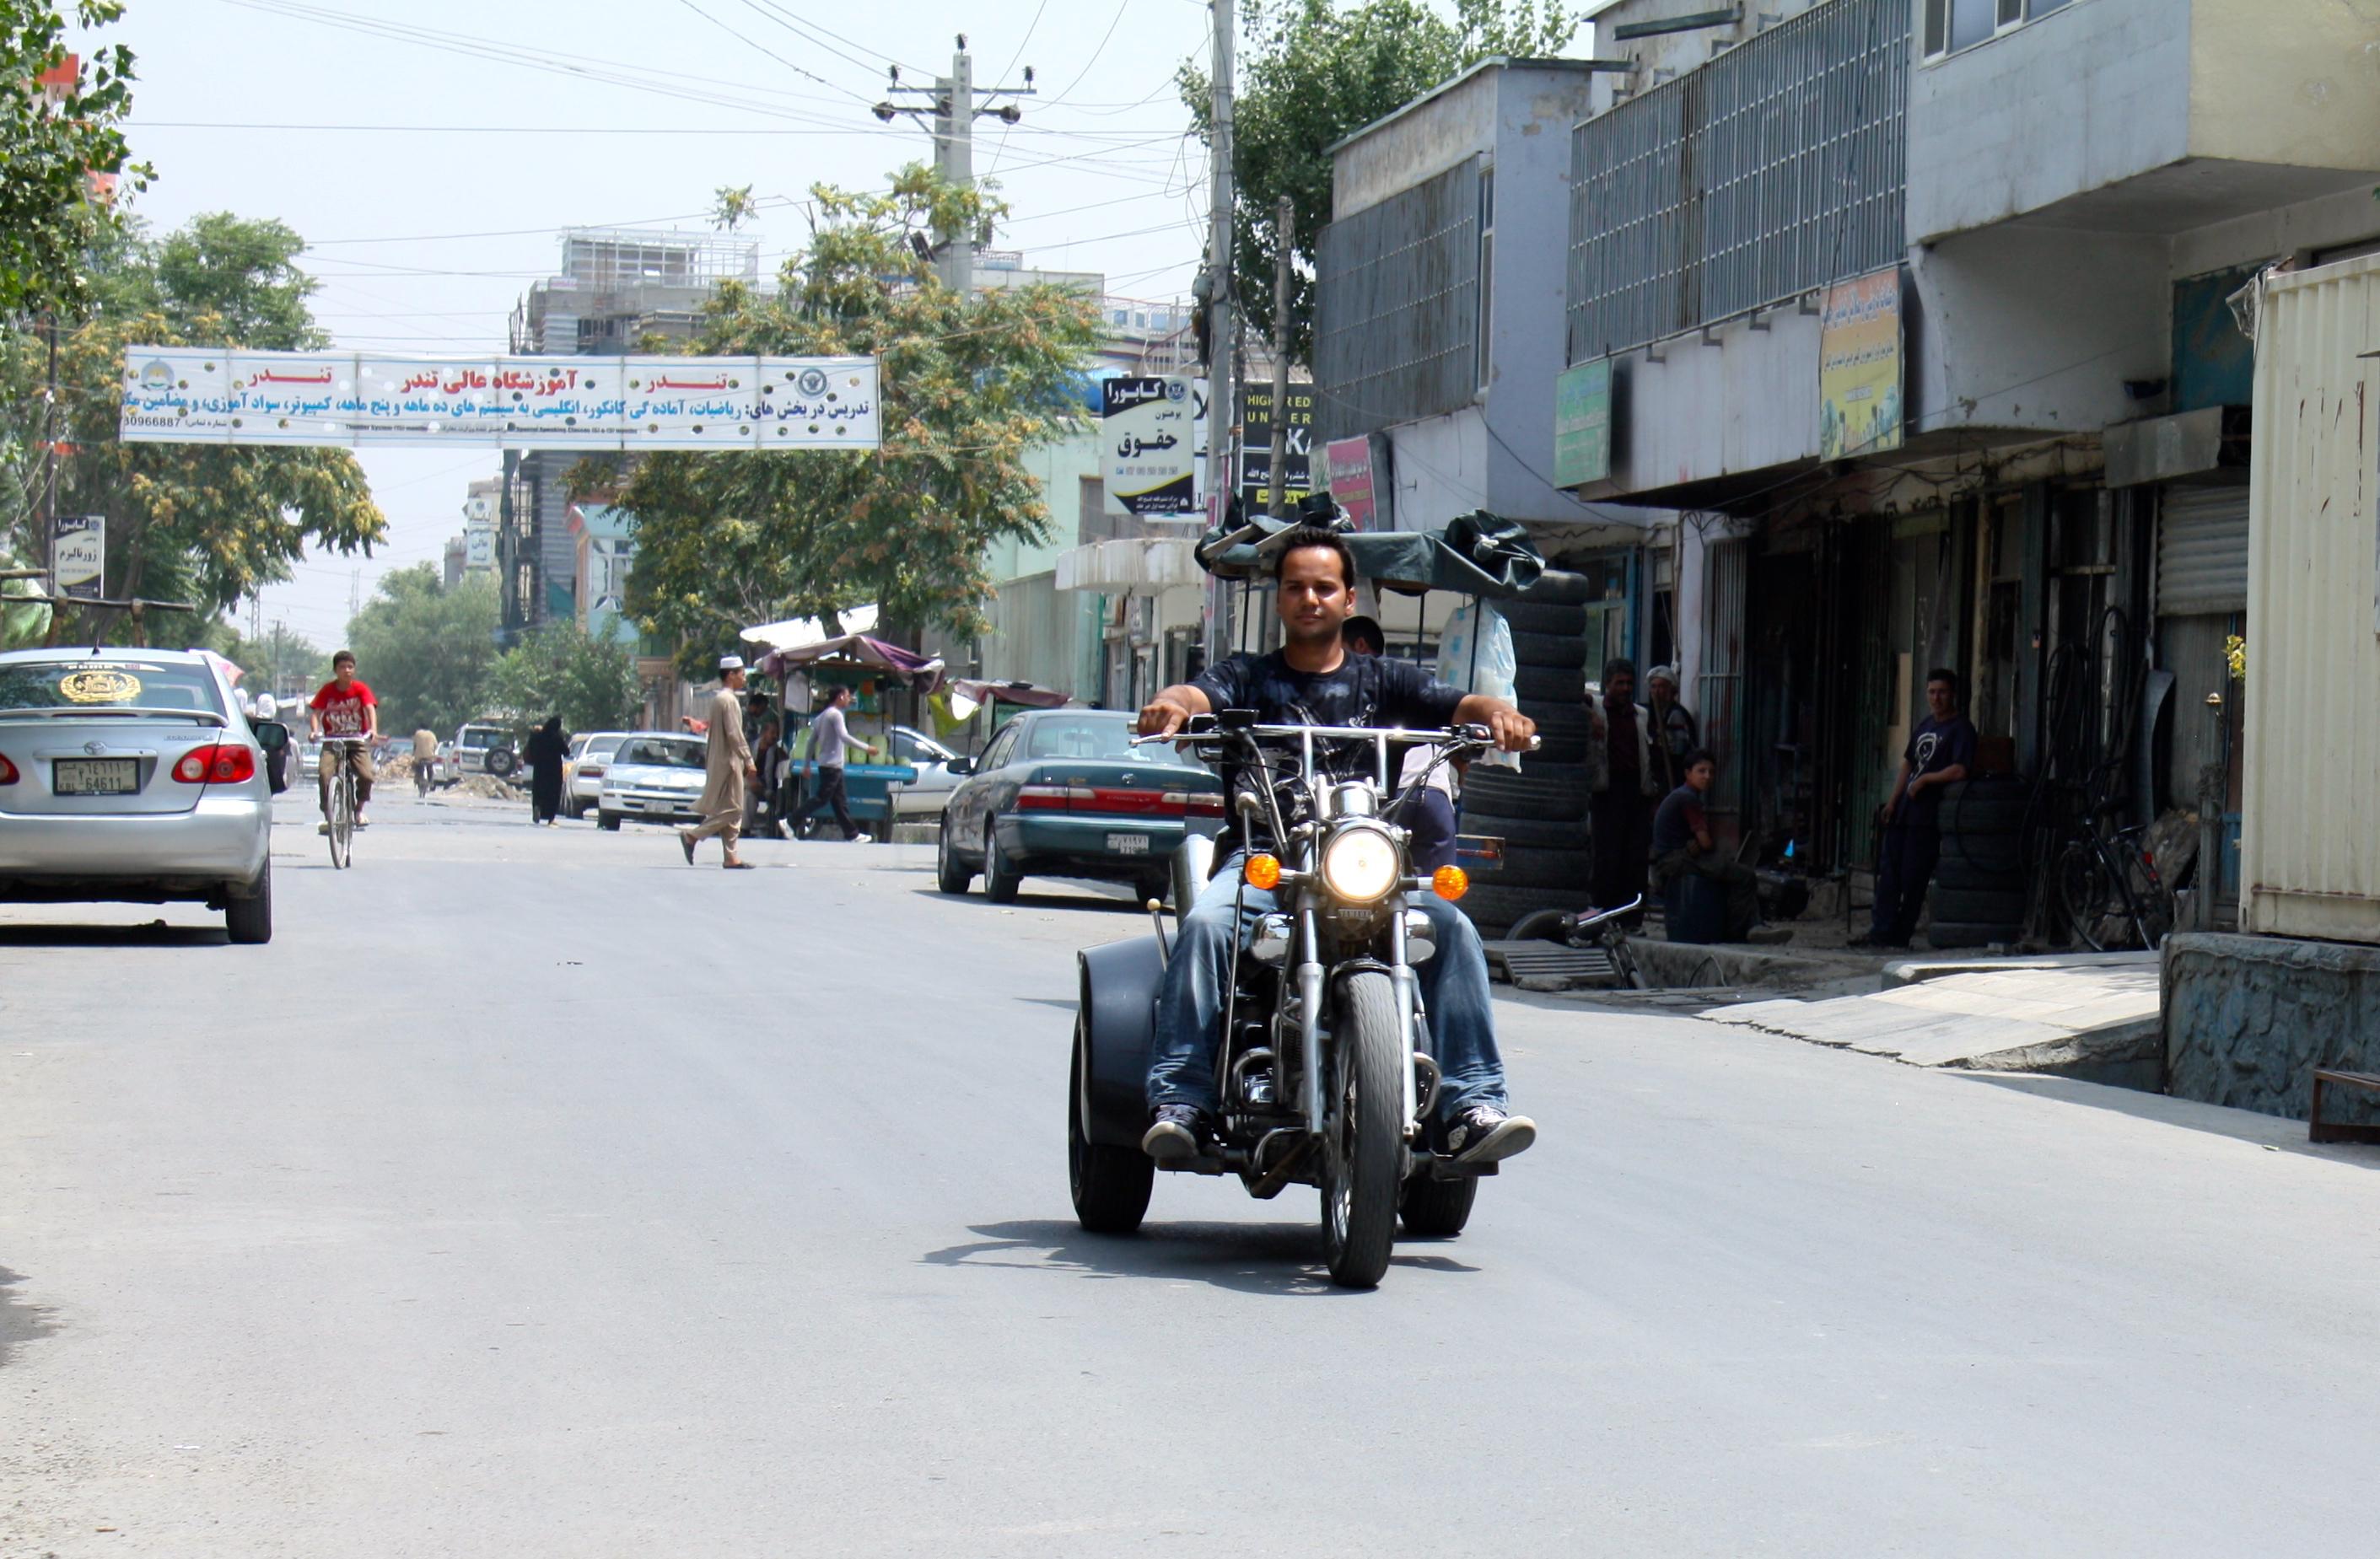 #AfghanInventor: Mobilizing Afghanistan's disabled